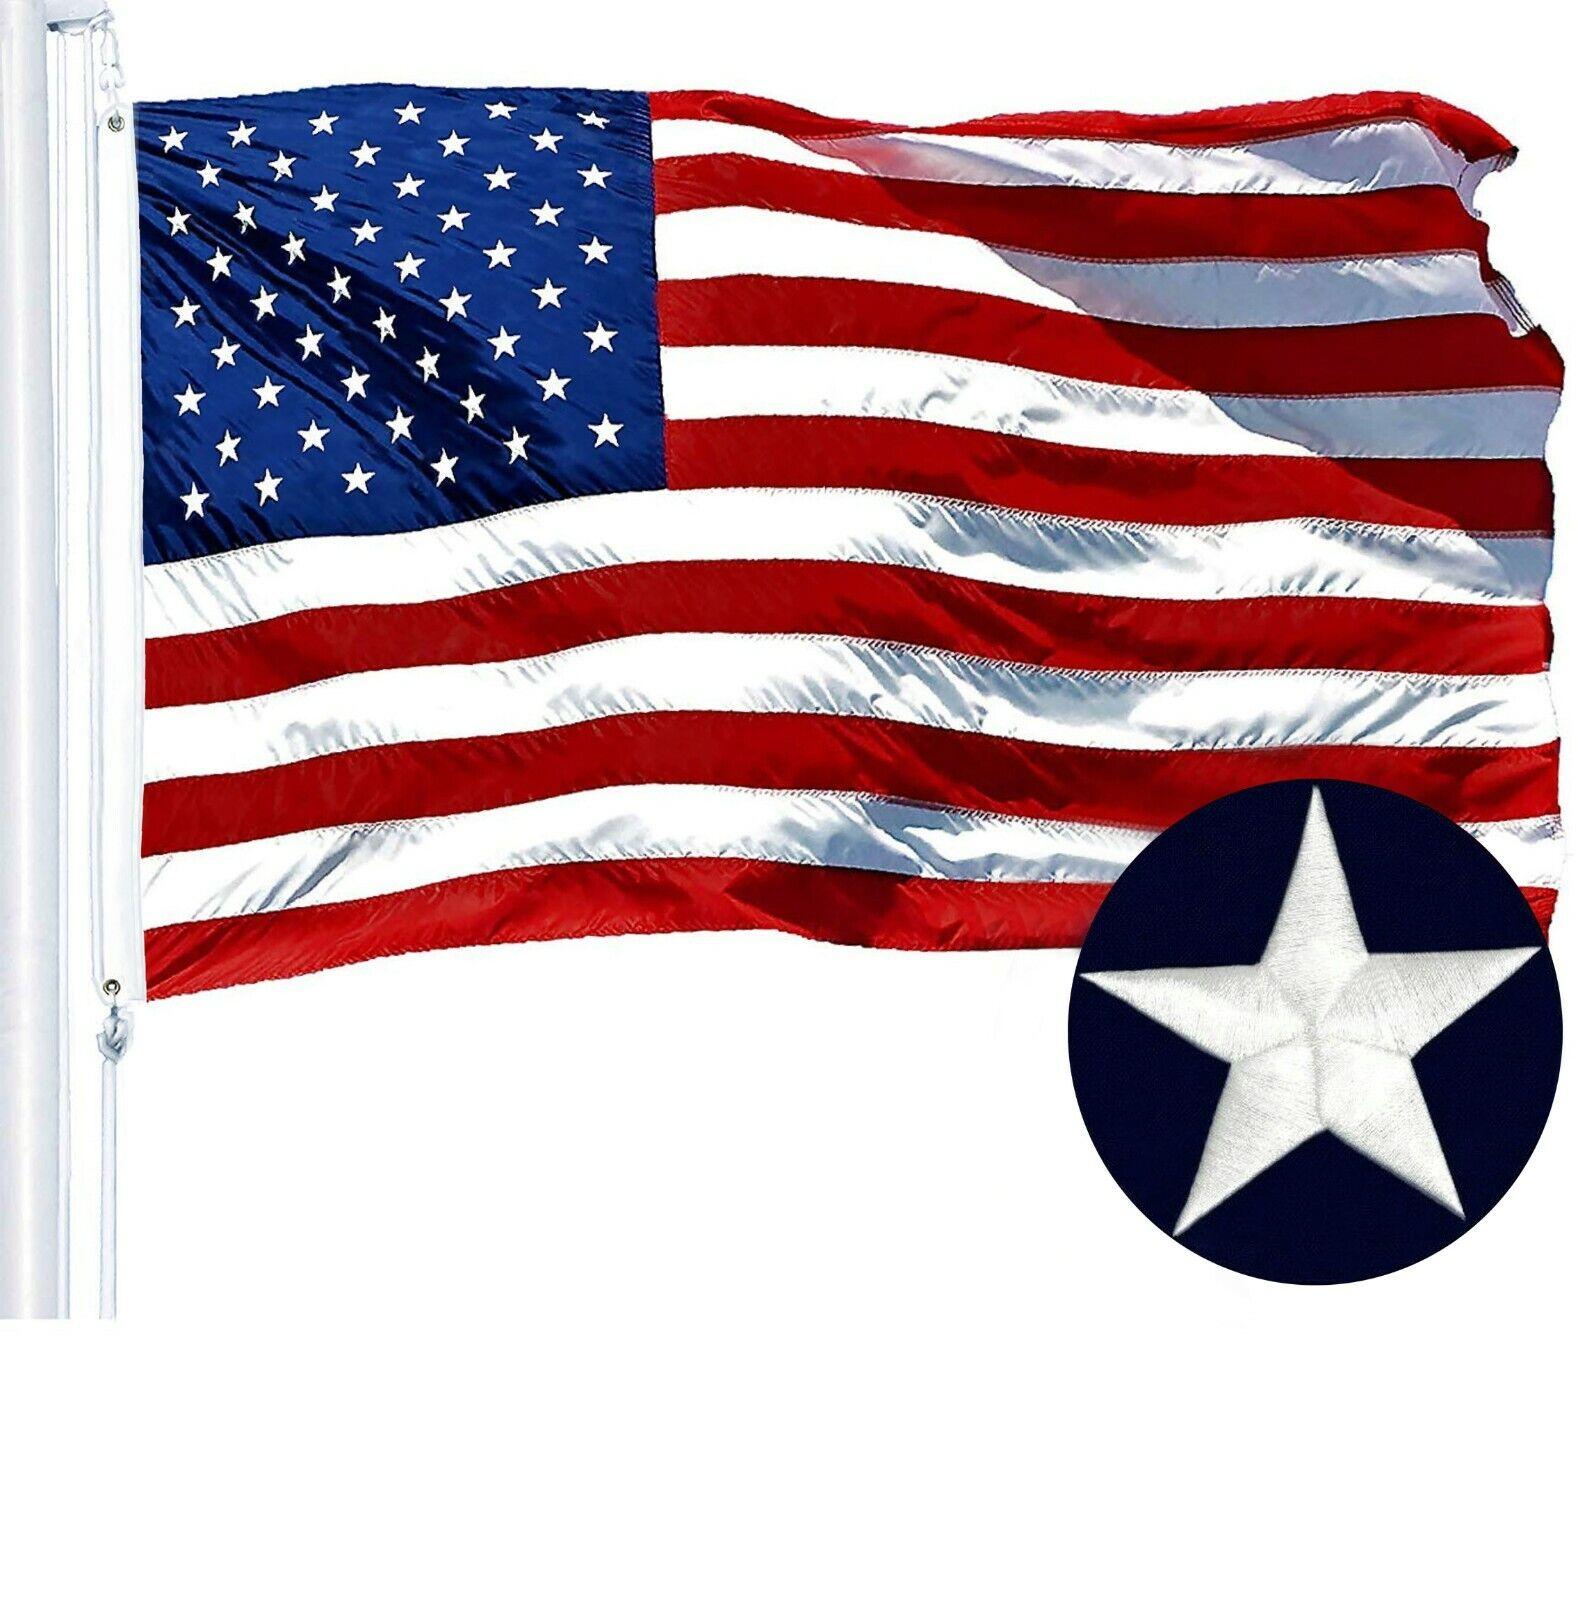 2'x3' ft, American Flag US USA | EMBROIDERED Stars, Sewn Str